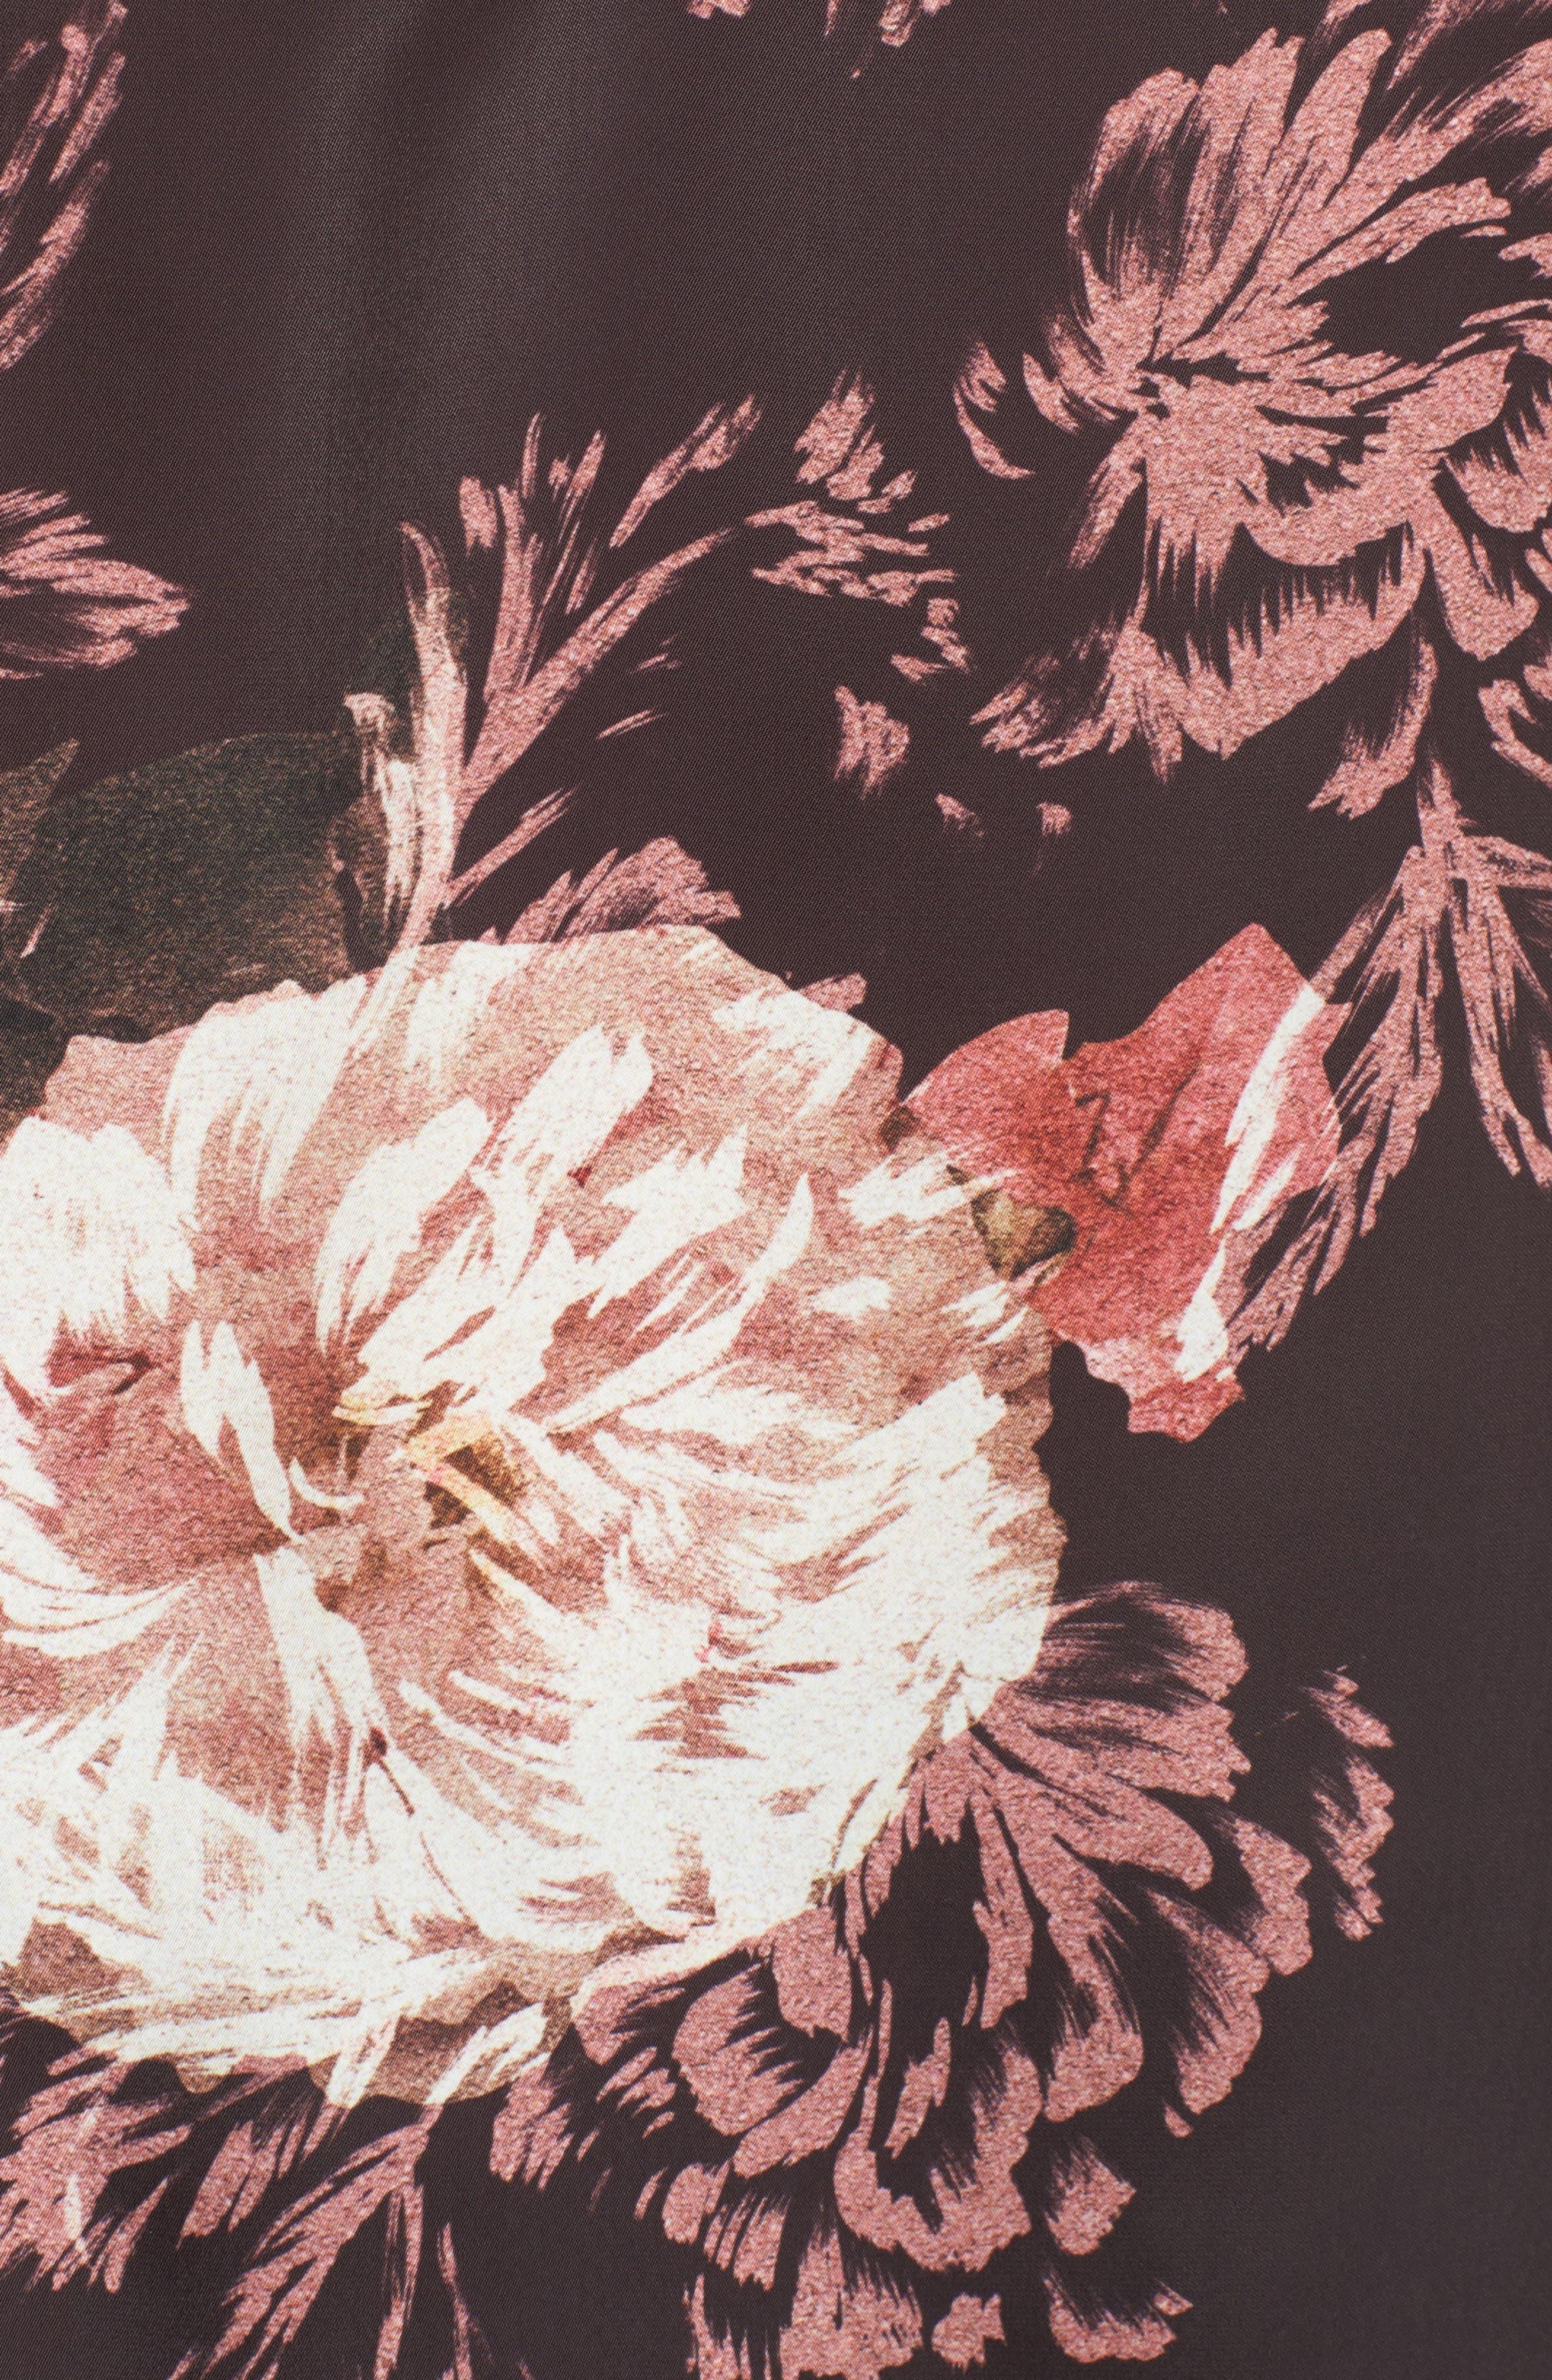 Marnie Victorian Floral Cold Shoulder Top,                             Alternate thumbnail 5, color,                             Victorian Floral